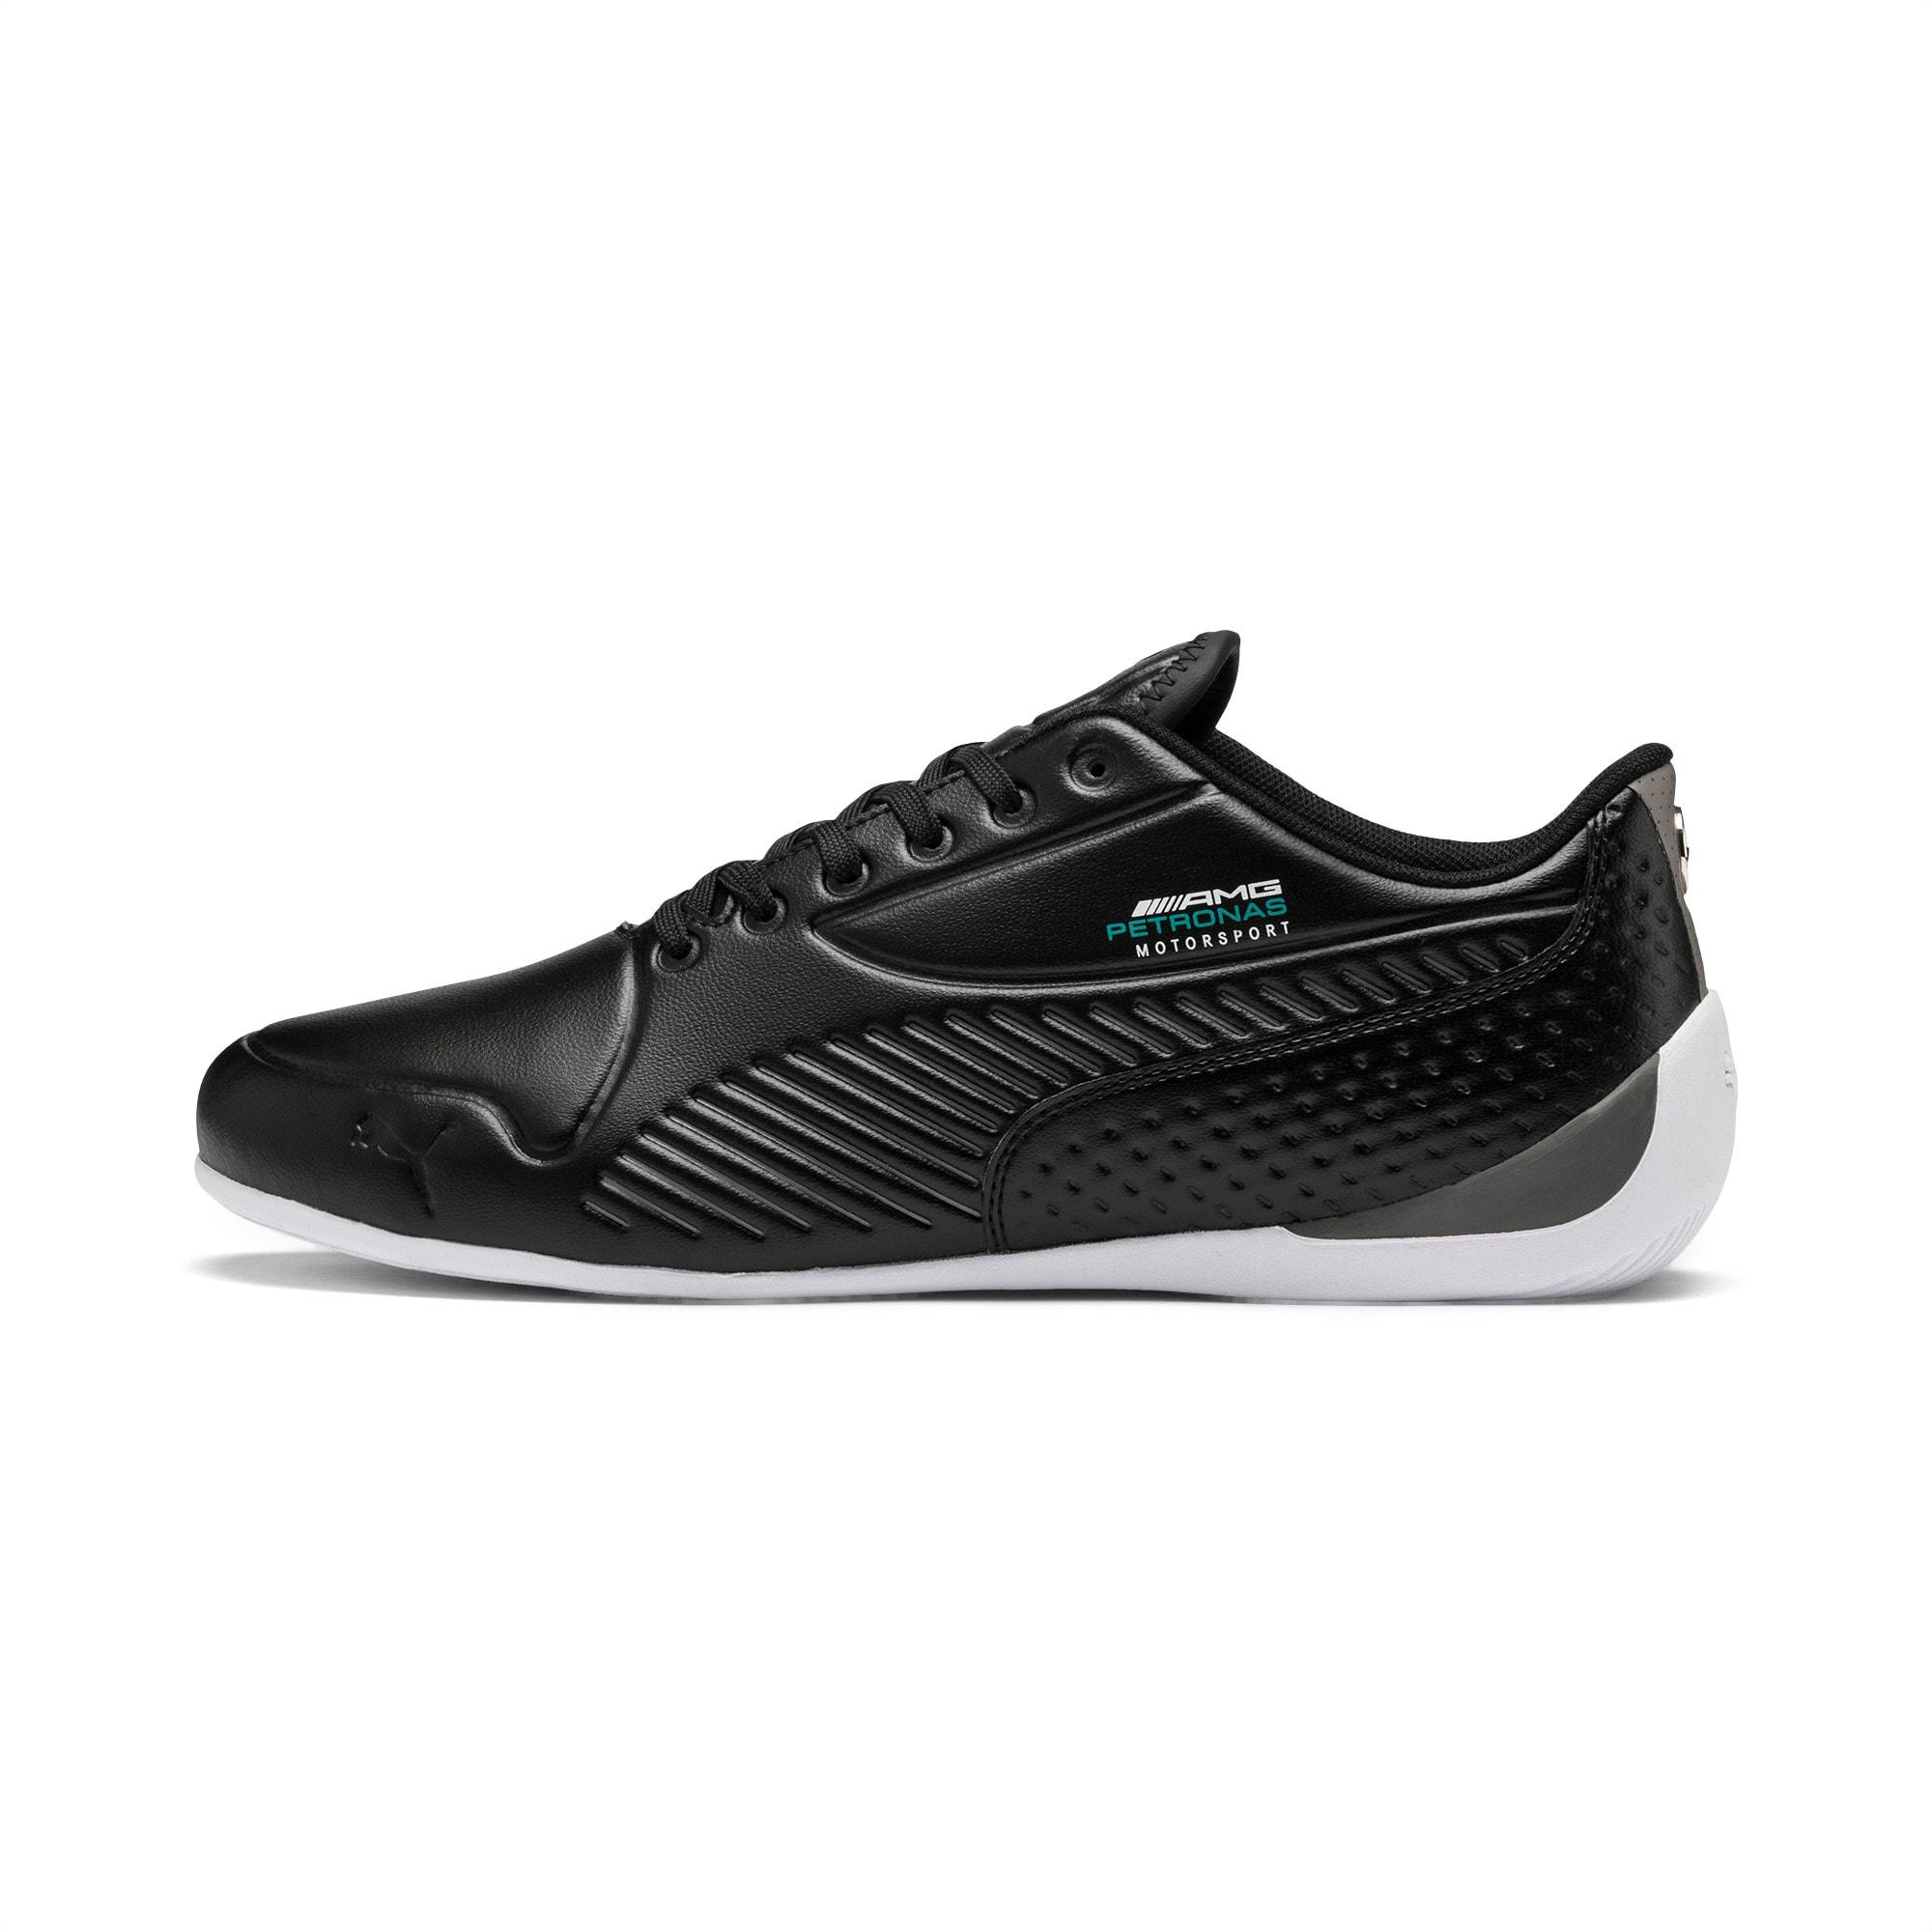 Puma Mercedes AMG Petronas Leather zapatilla deportiva de